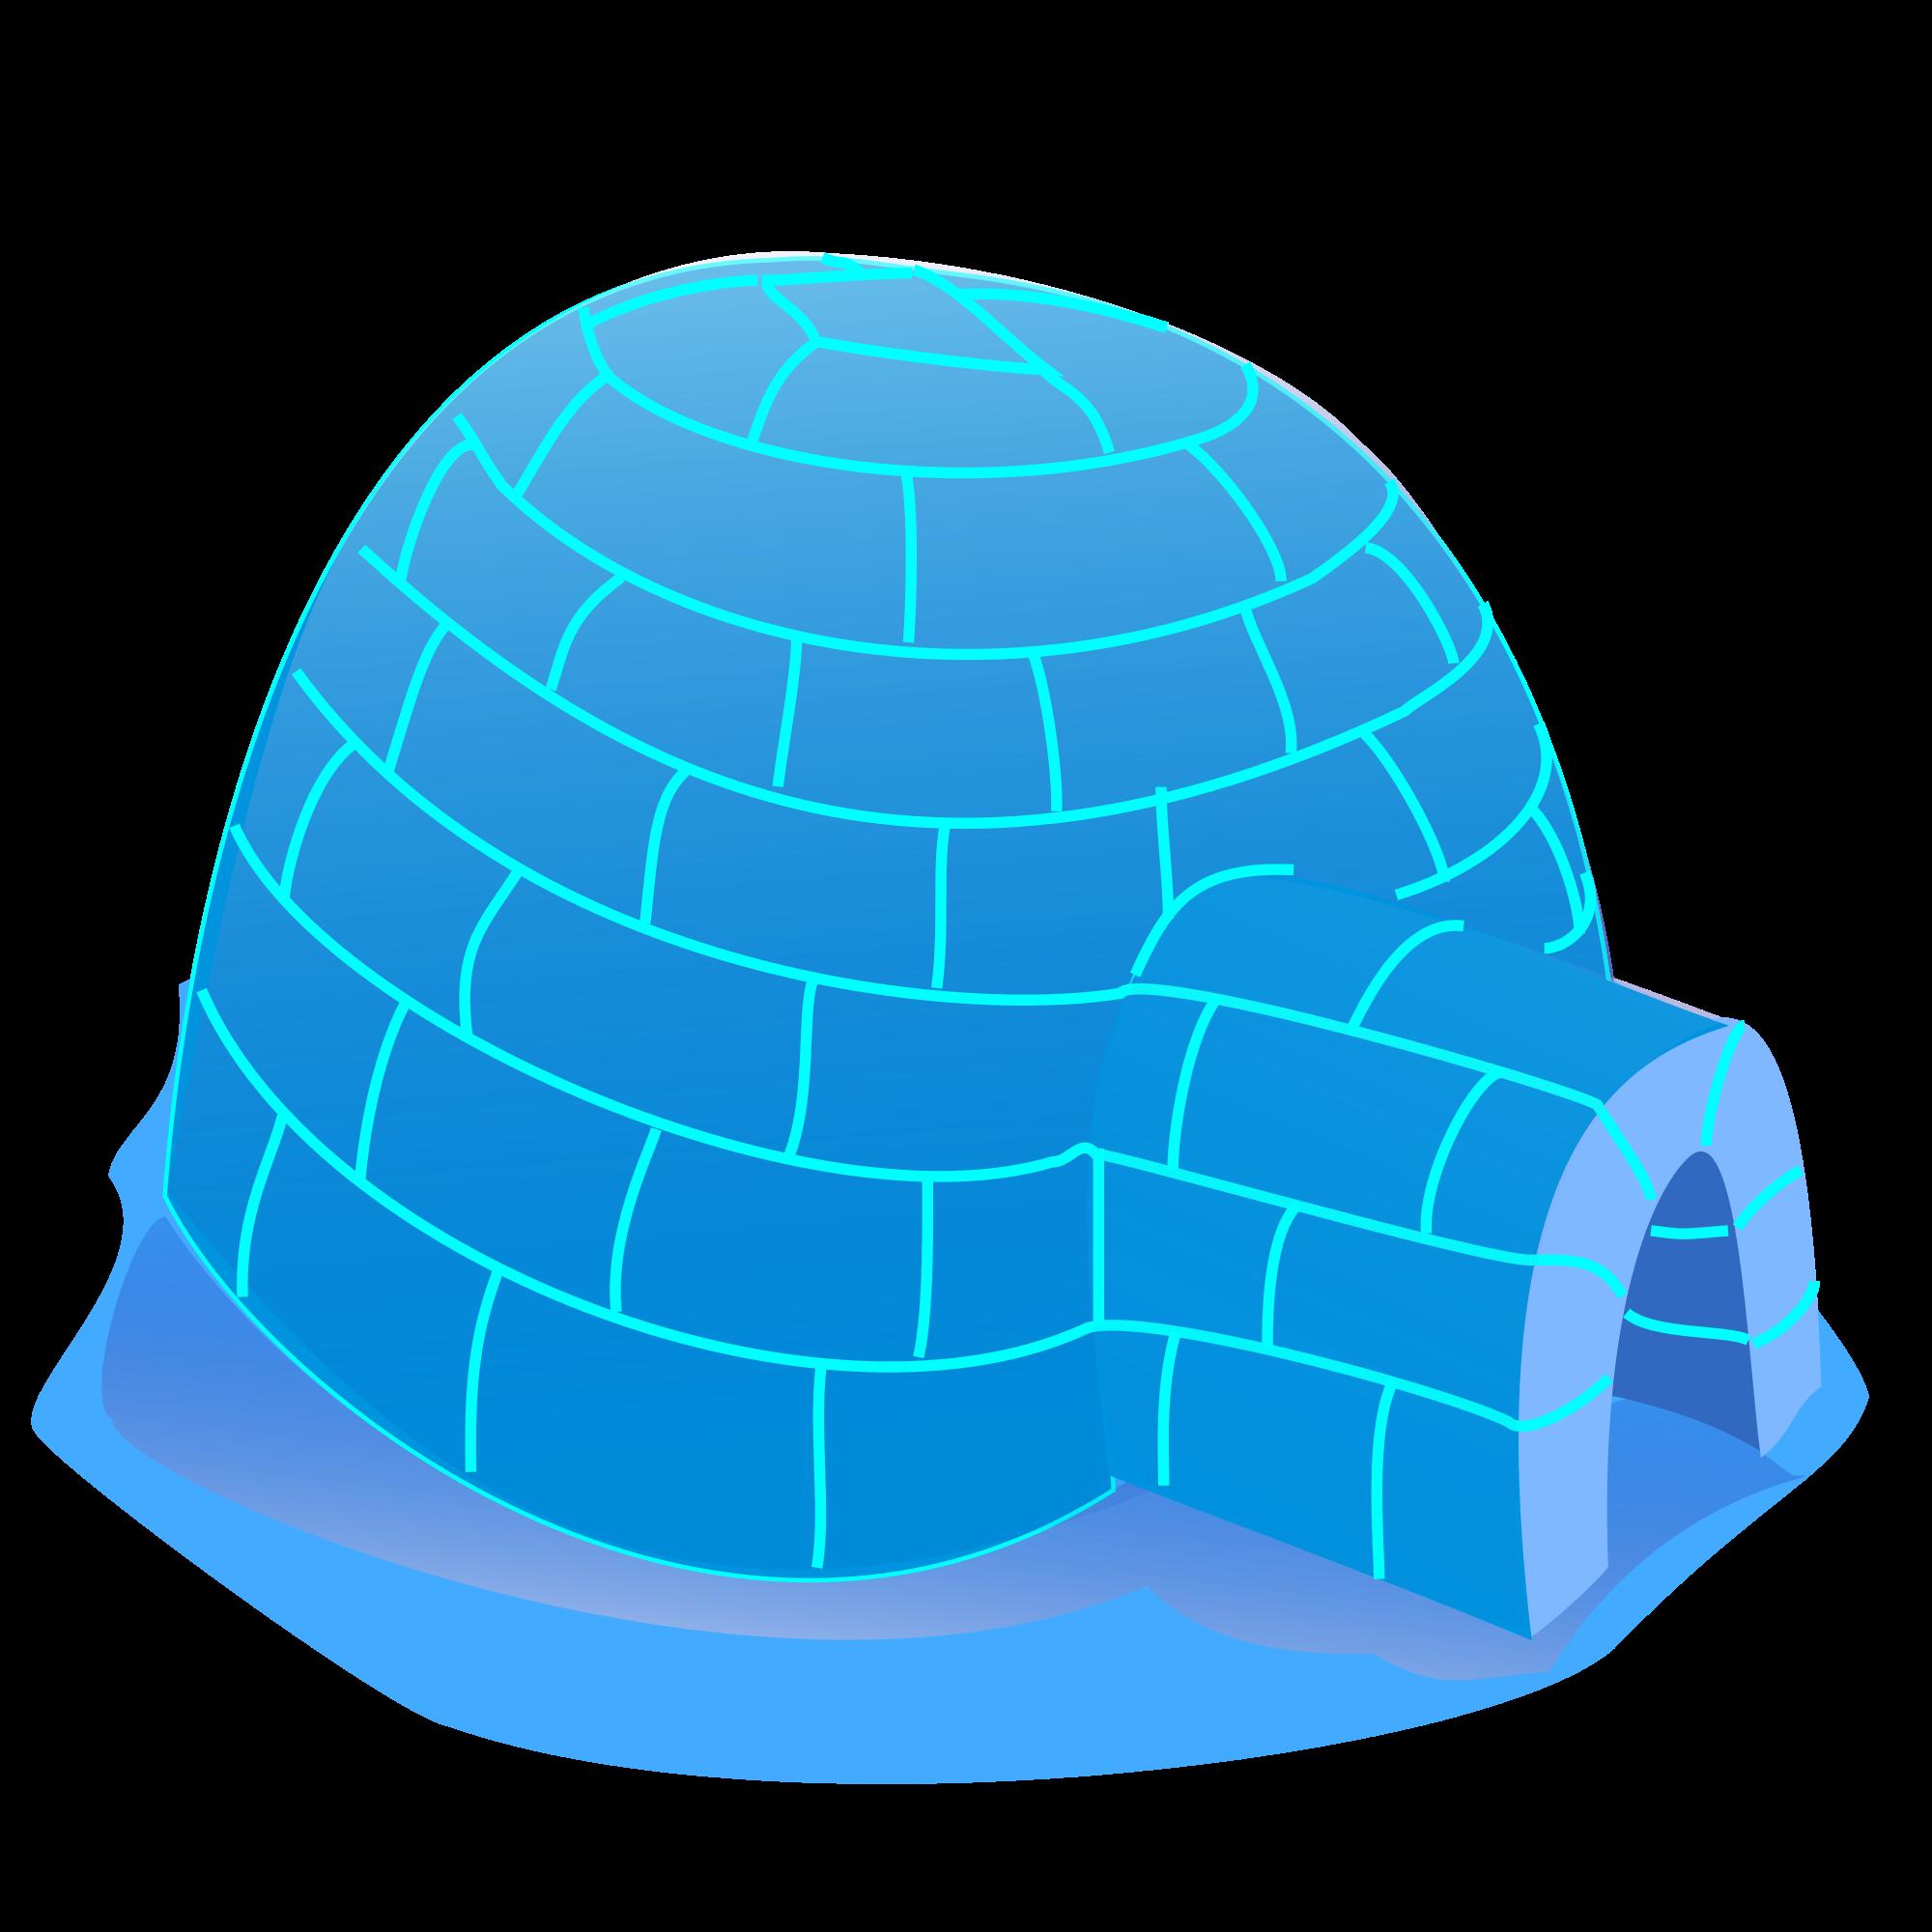 File:Tux Paint igloo.svg - Wikimedia Commons clip art